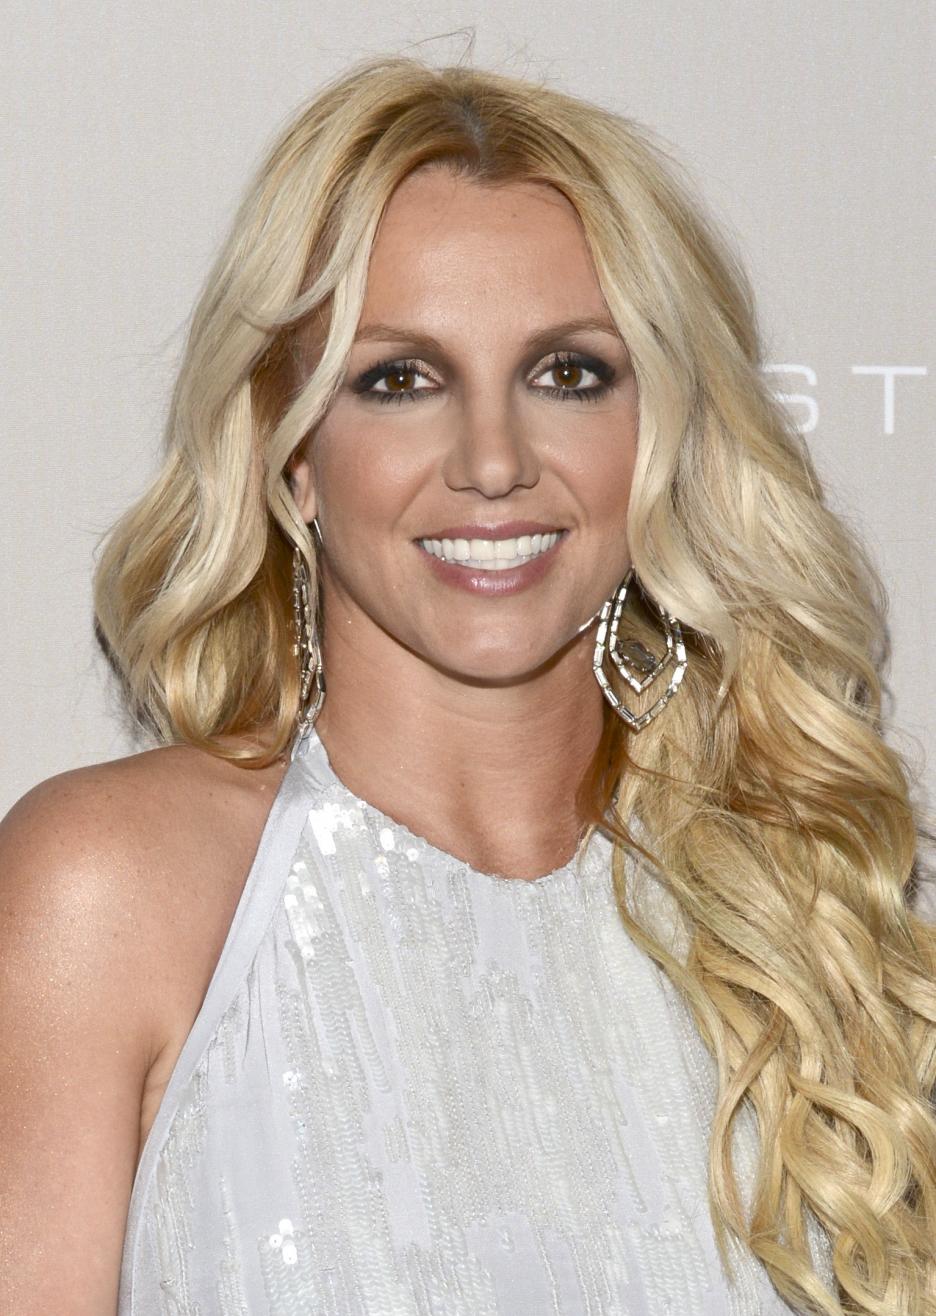 CELEBRITY PROFILES: BRITNEY SPEARS Britney Spears